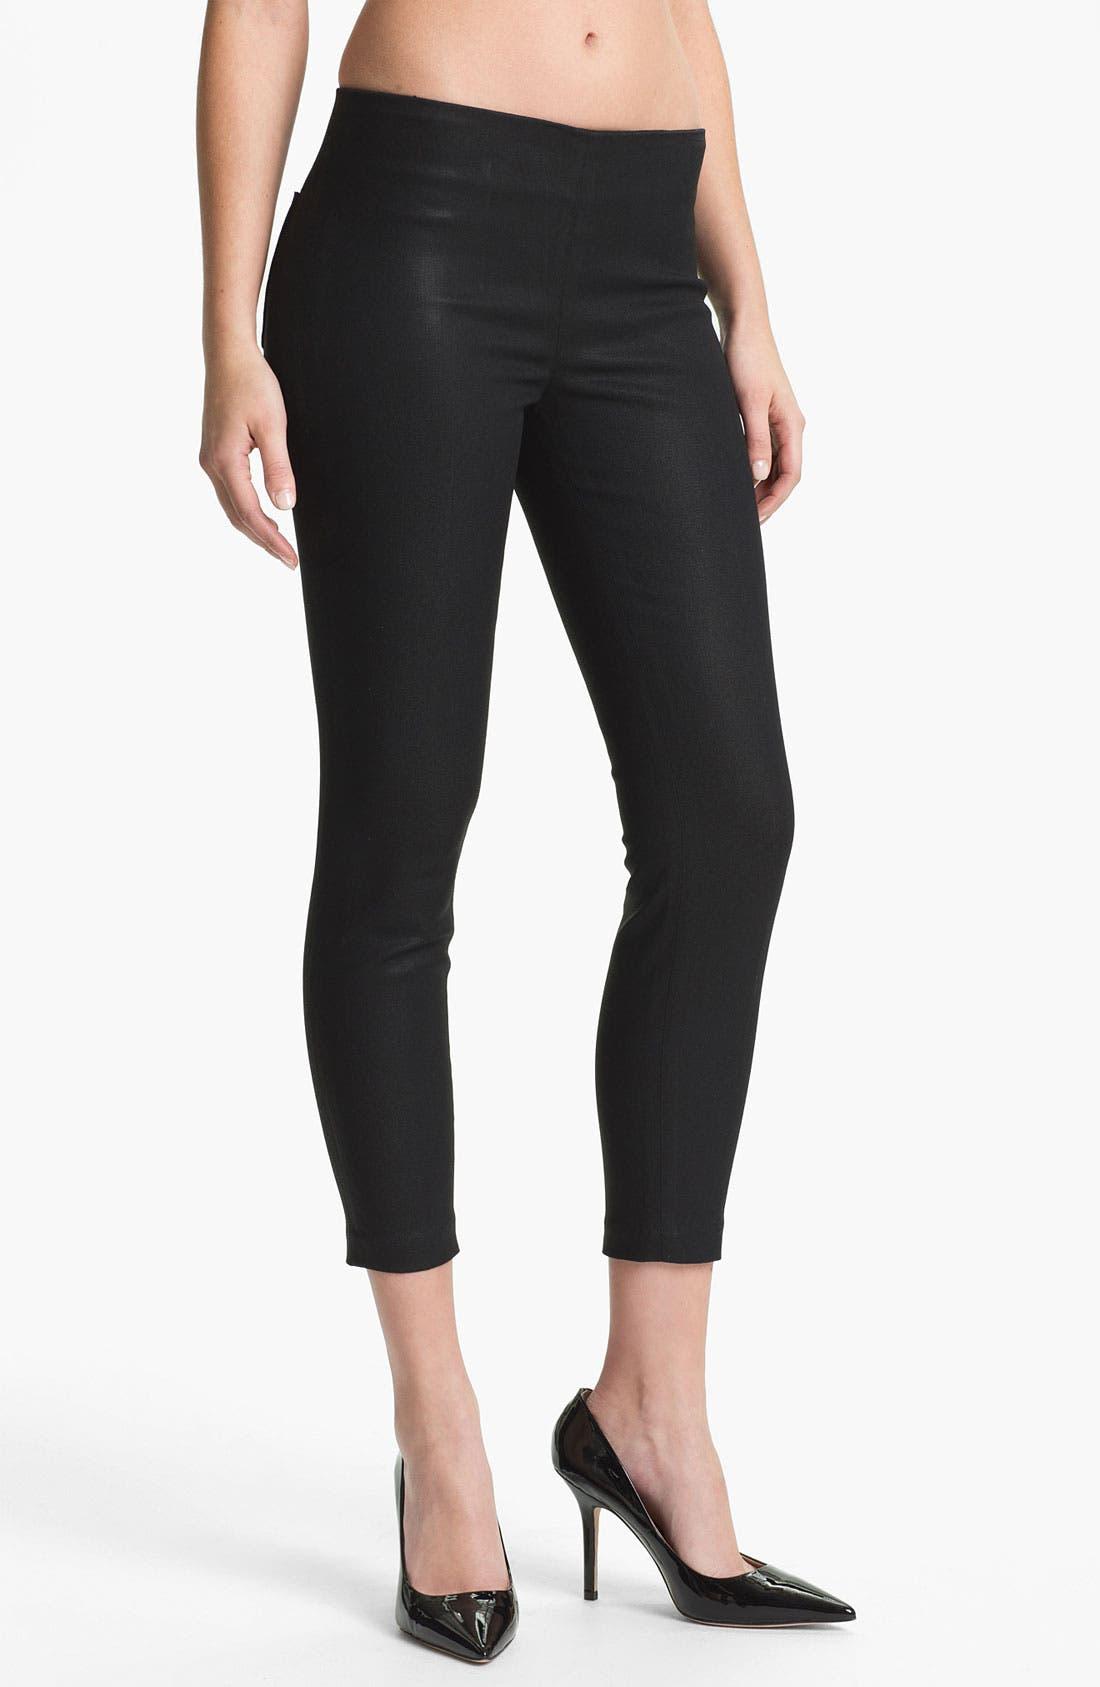 Alternate Image 1 Selected - J Brand Stretch Capri Leggings (Coated Black)